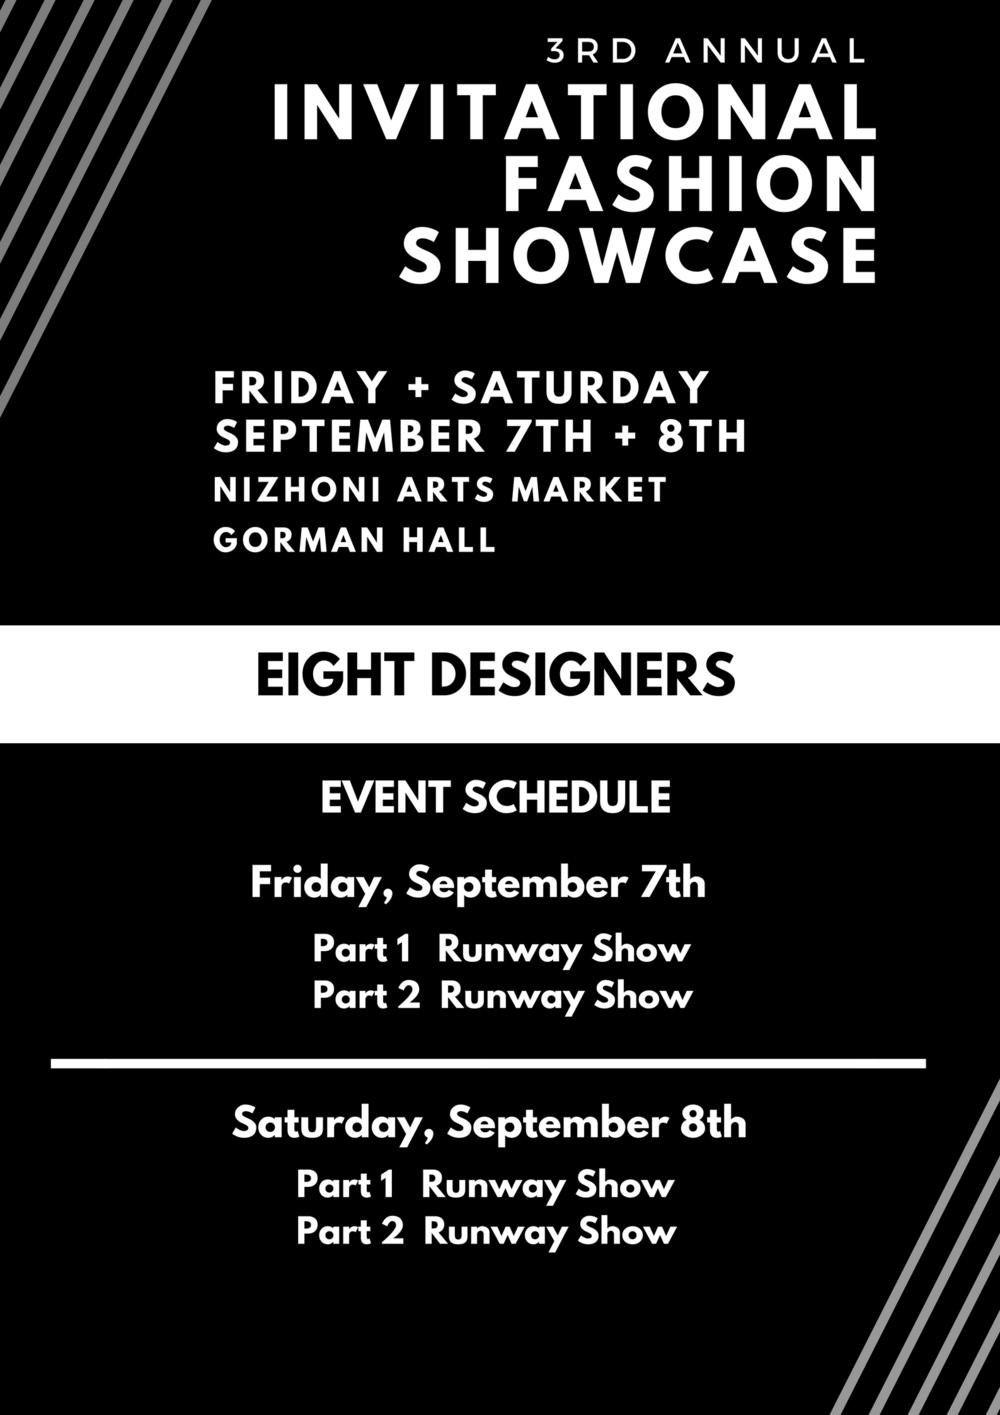 3rd Annual Invational Fashion Showcase Navajo Nation